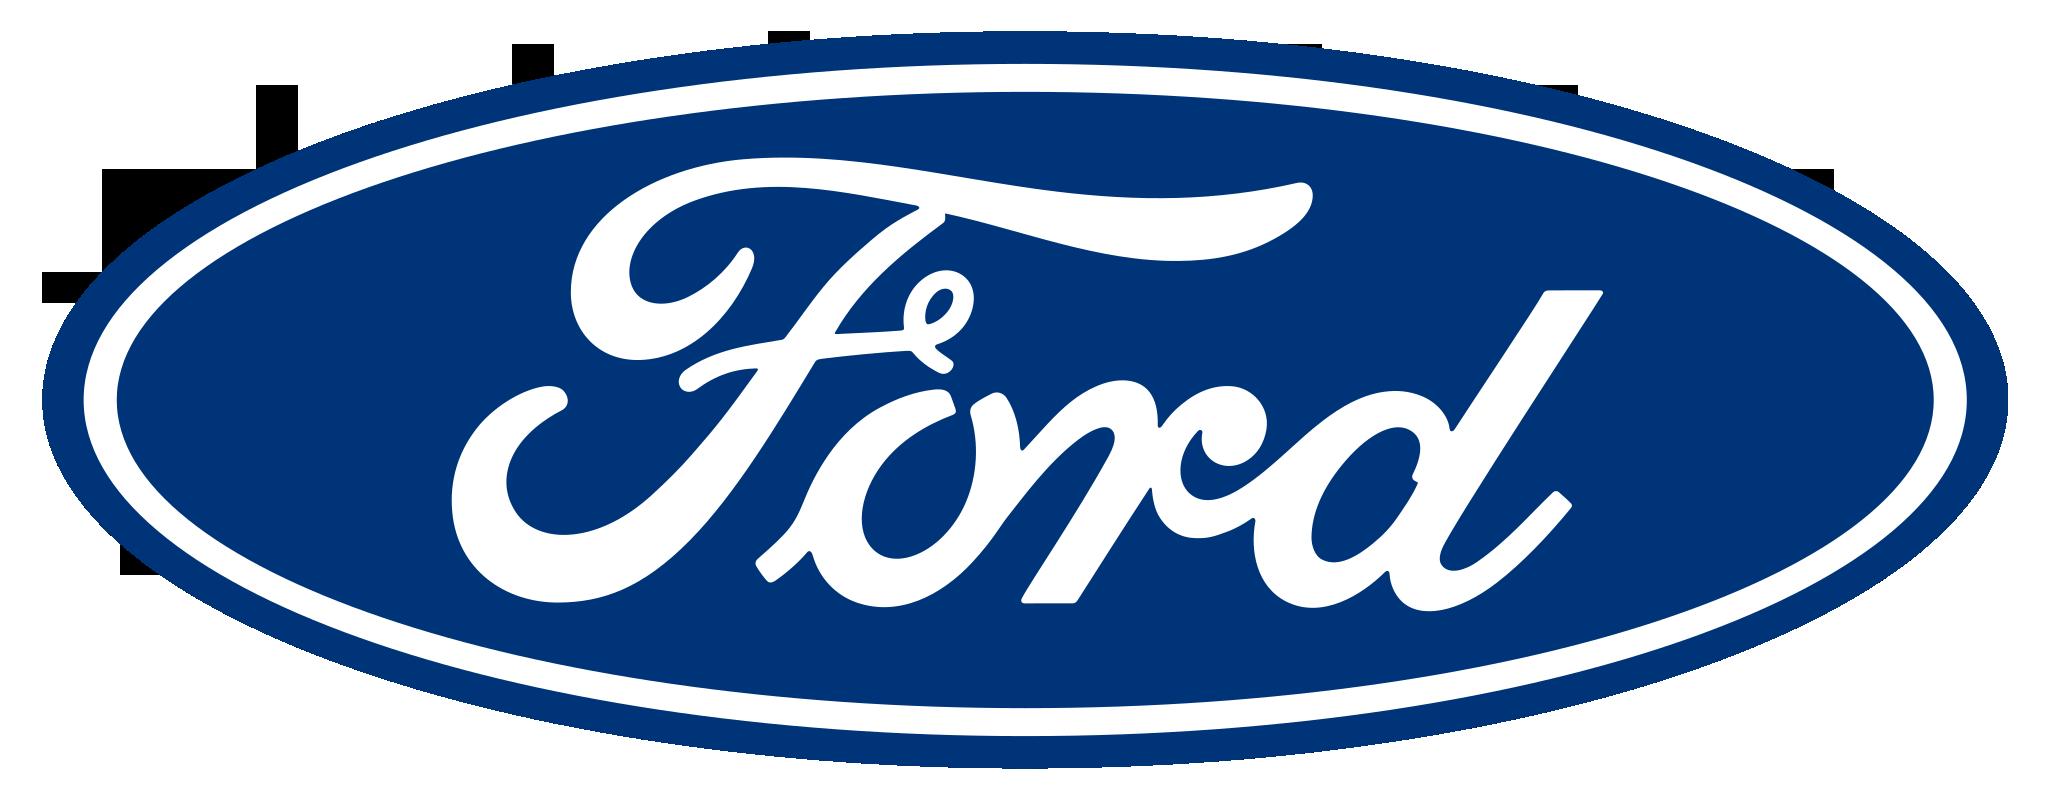 ford-logo-2017